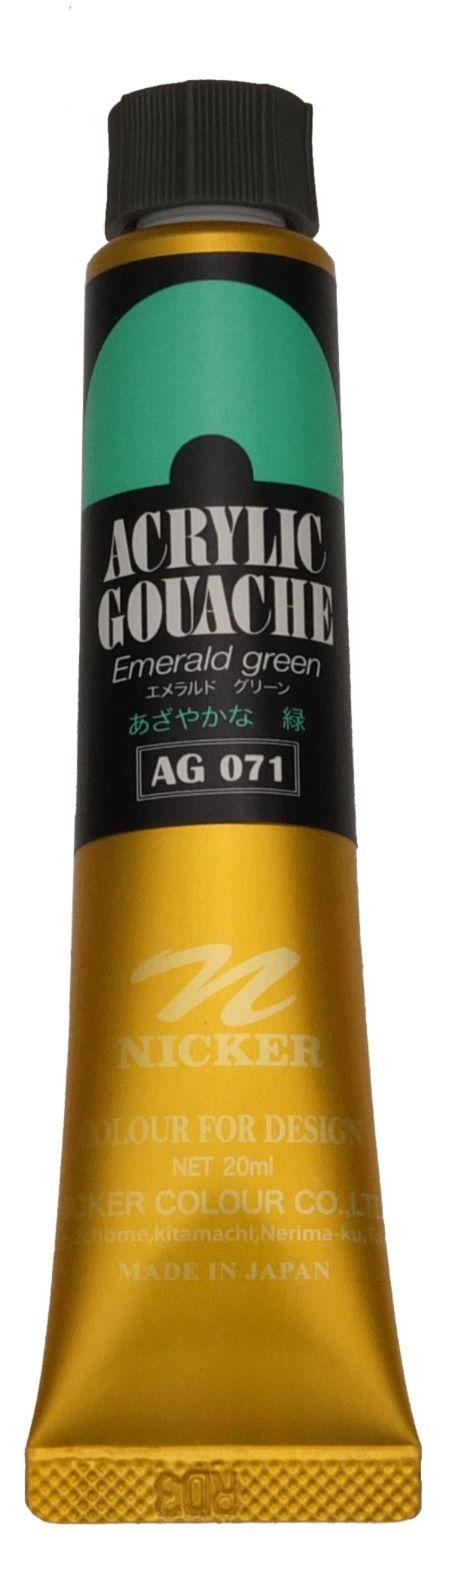 <Discontinued> ACRYLIC GOUACHE 20ml AG071 EMERALD GREEN